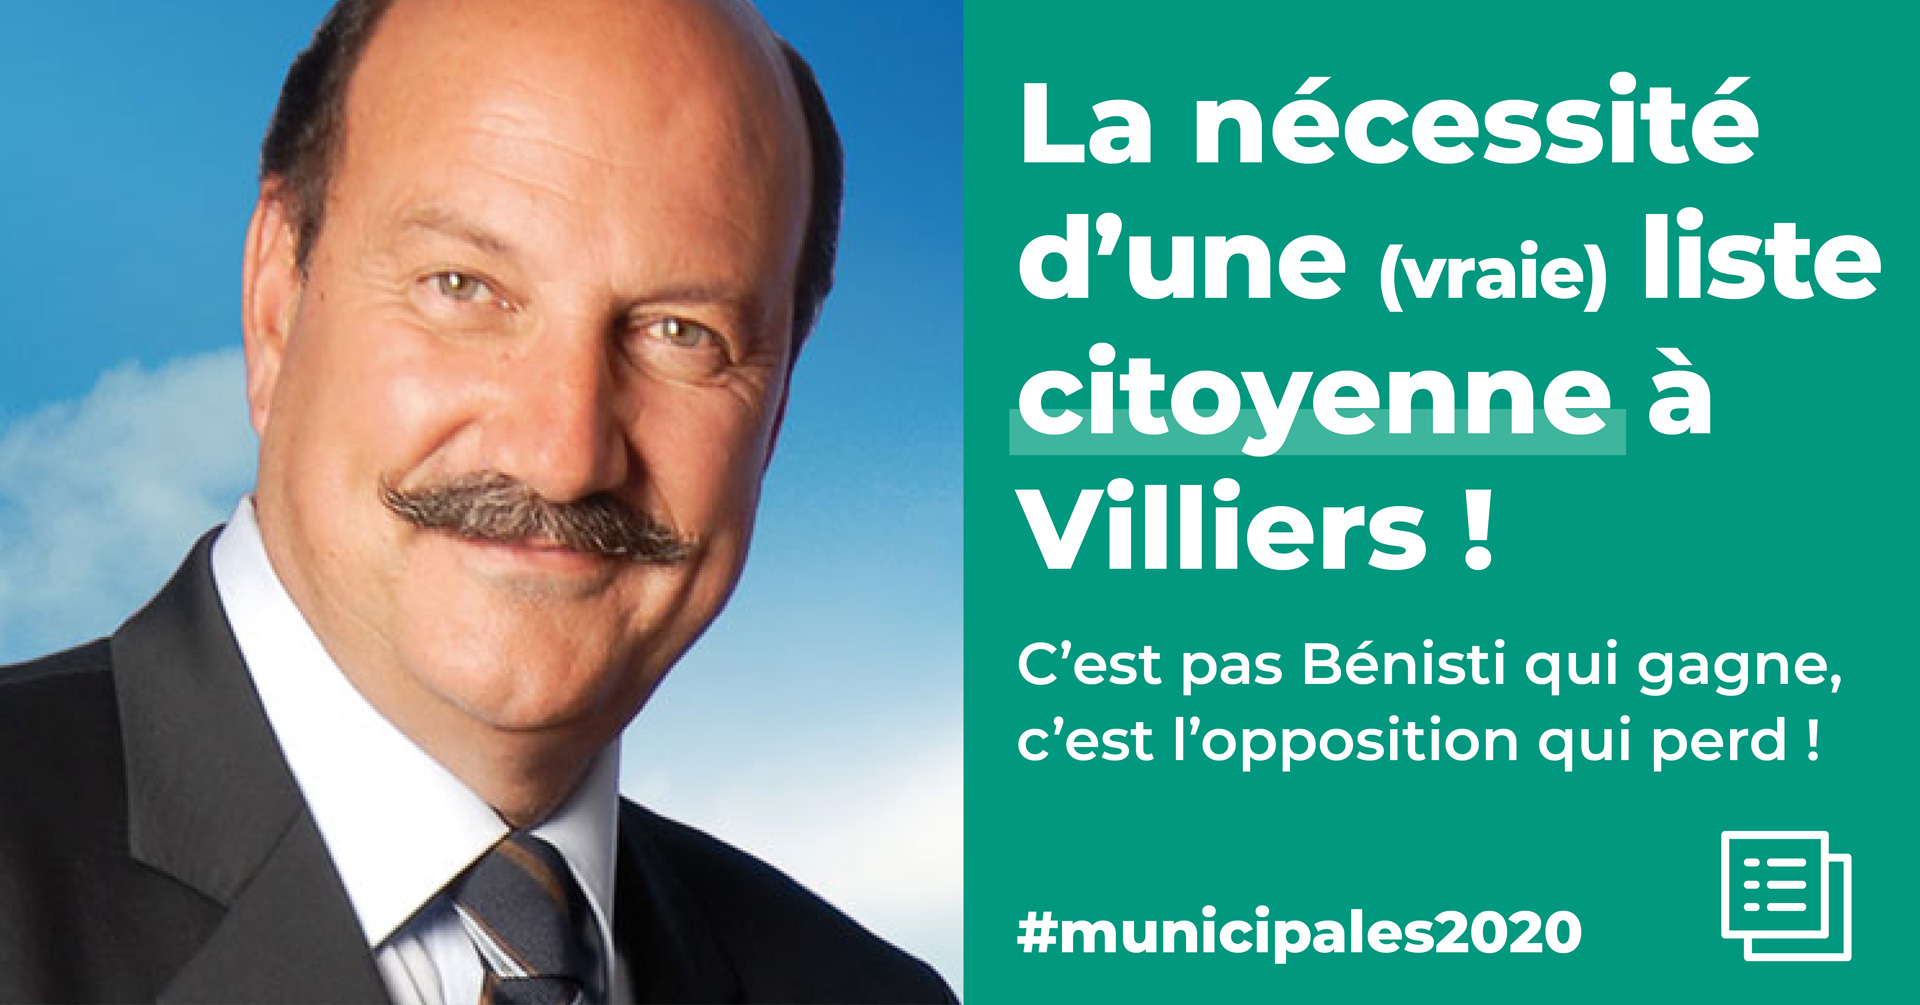 http://vav94.fr/wp-content/uploads/2020/01/JACQUES-ALAIN-BENISTI-LR-UMP-VILLIERS-A-VENIR-VILLIERS-SUR-MARNE-VAV-MUNICIPALES-2020-1.jpg